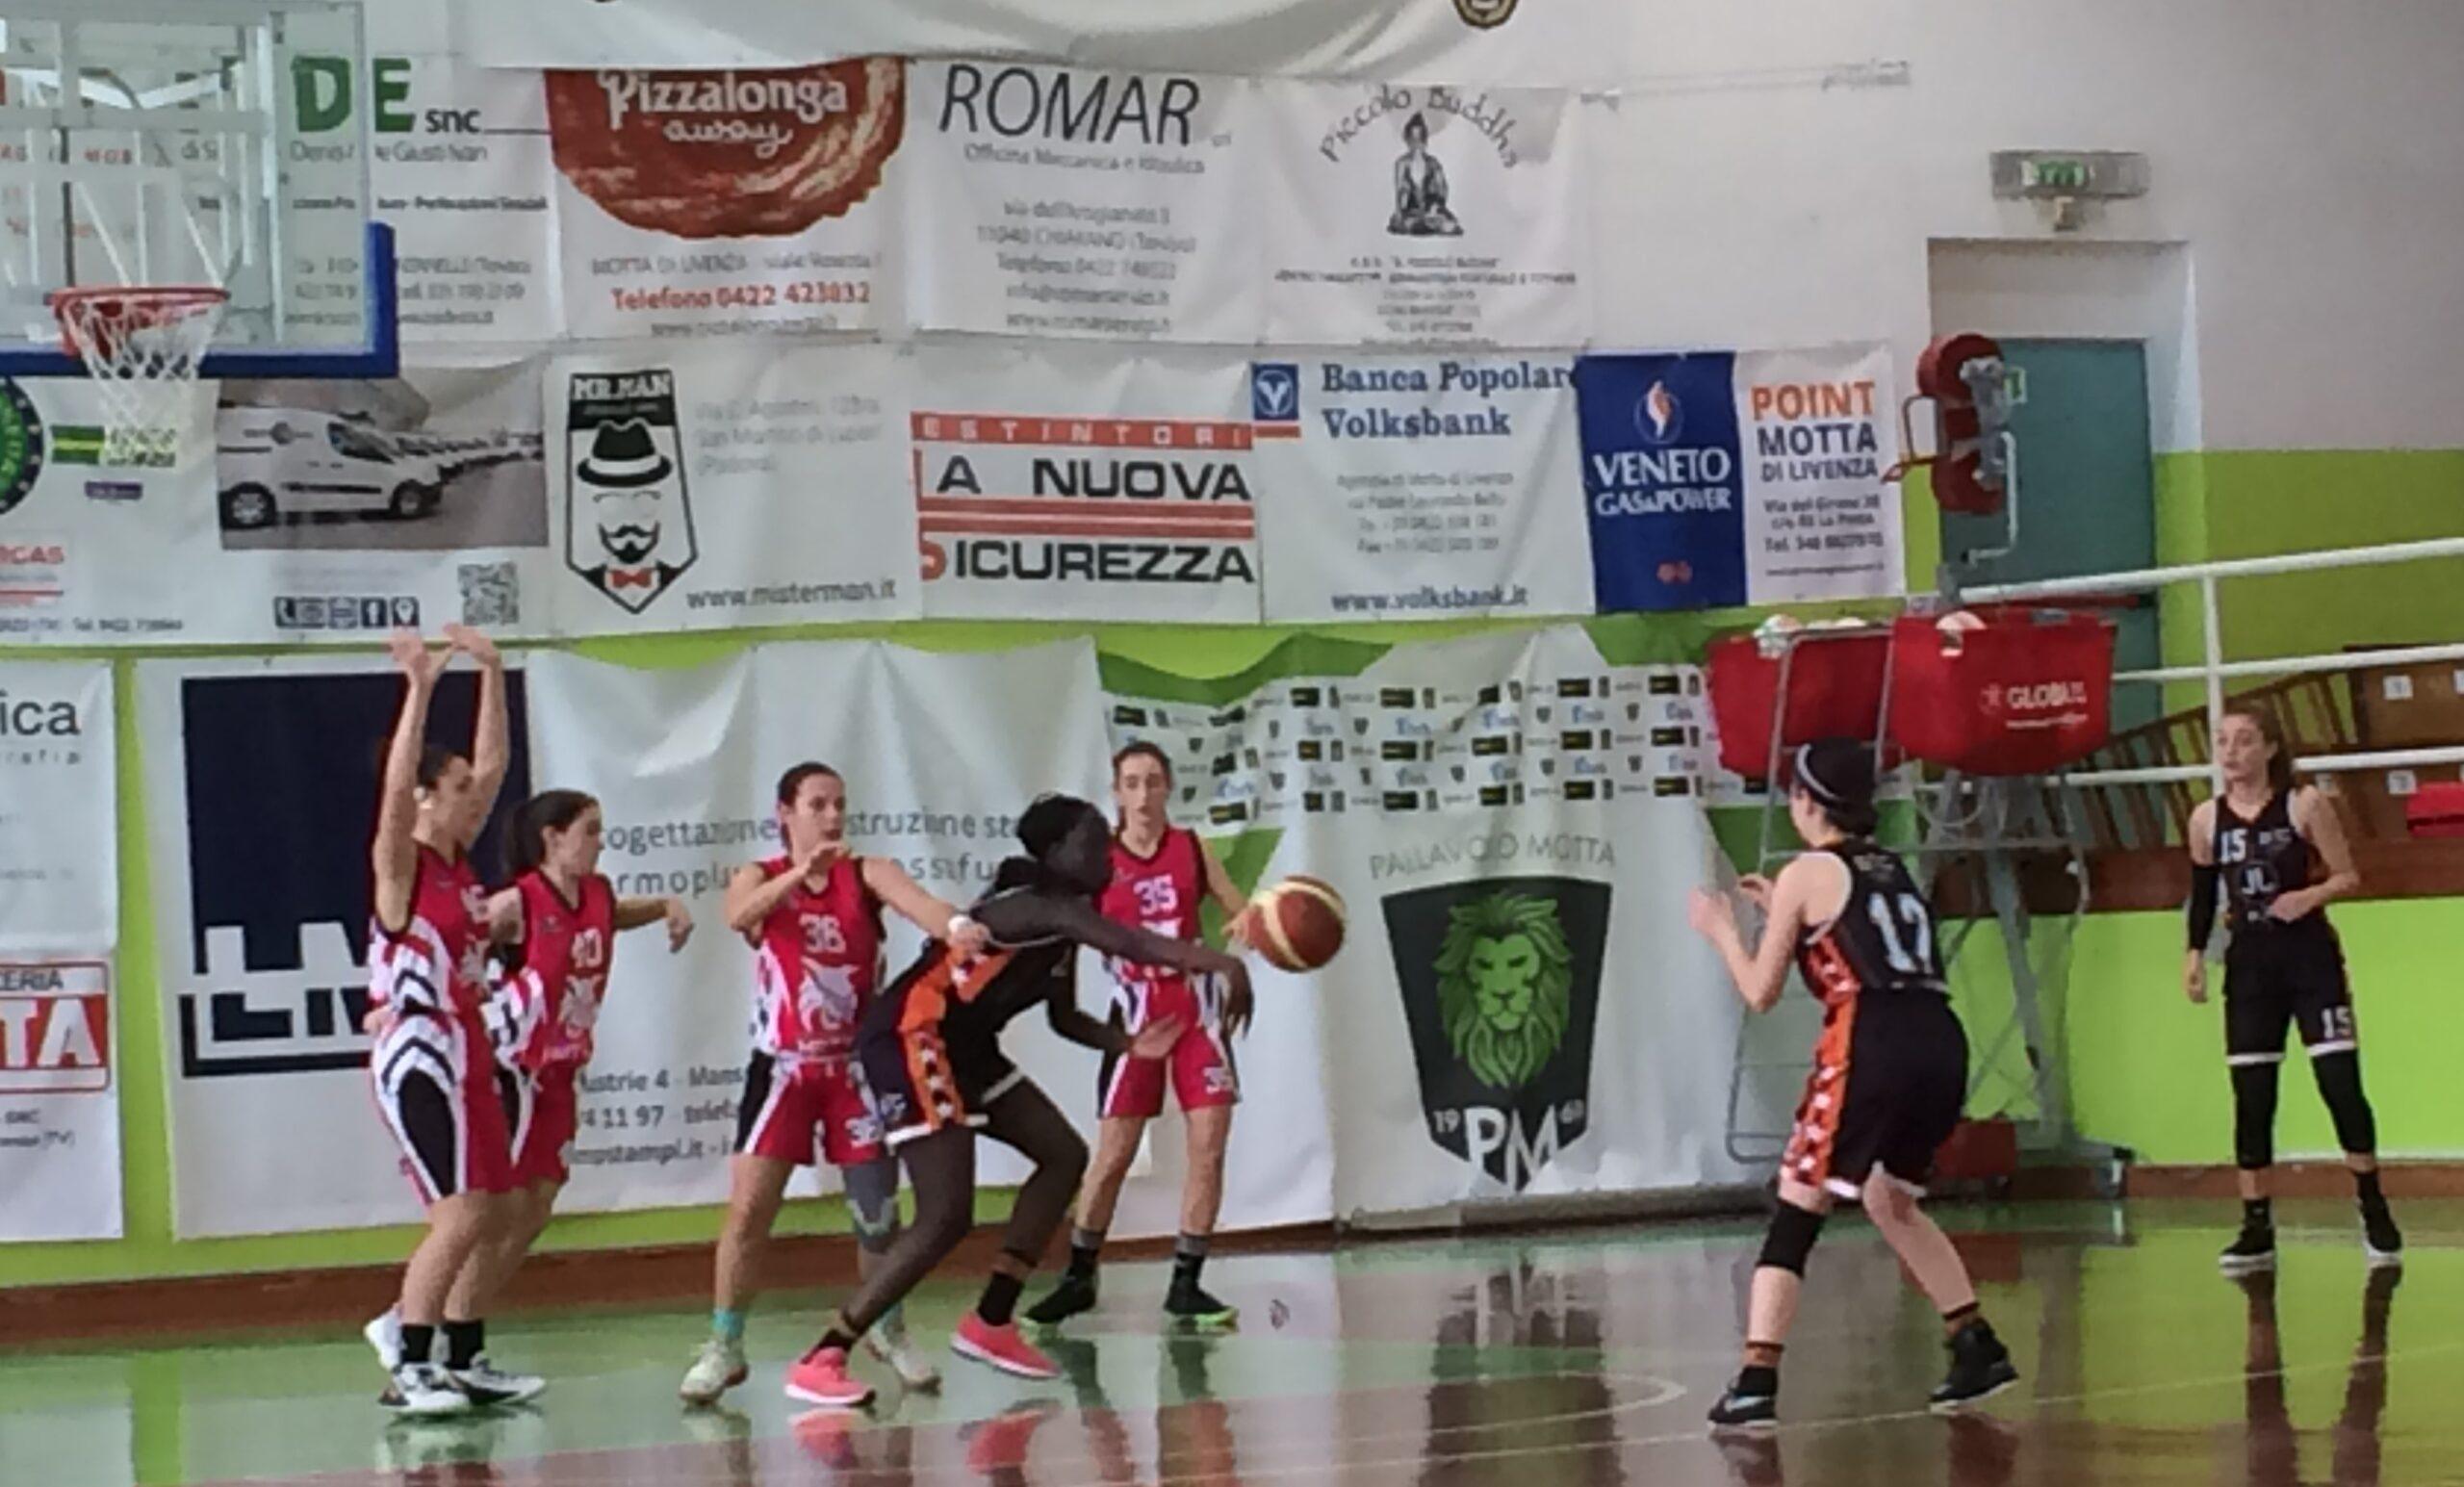 U16: PRIMO QUARTO FATALE VS MOTTA